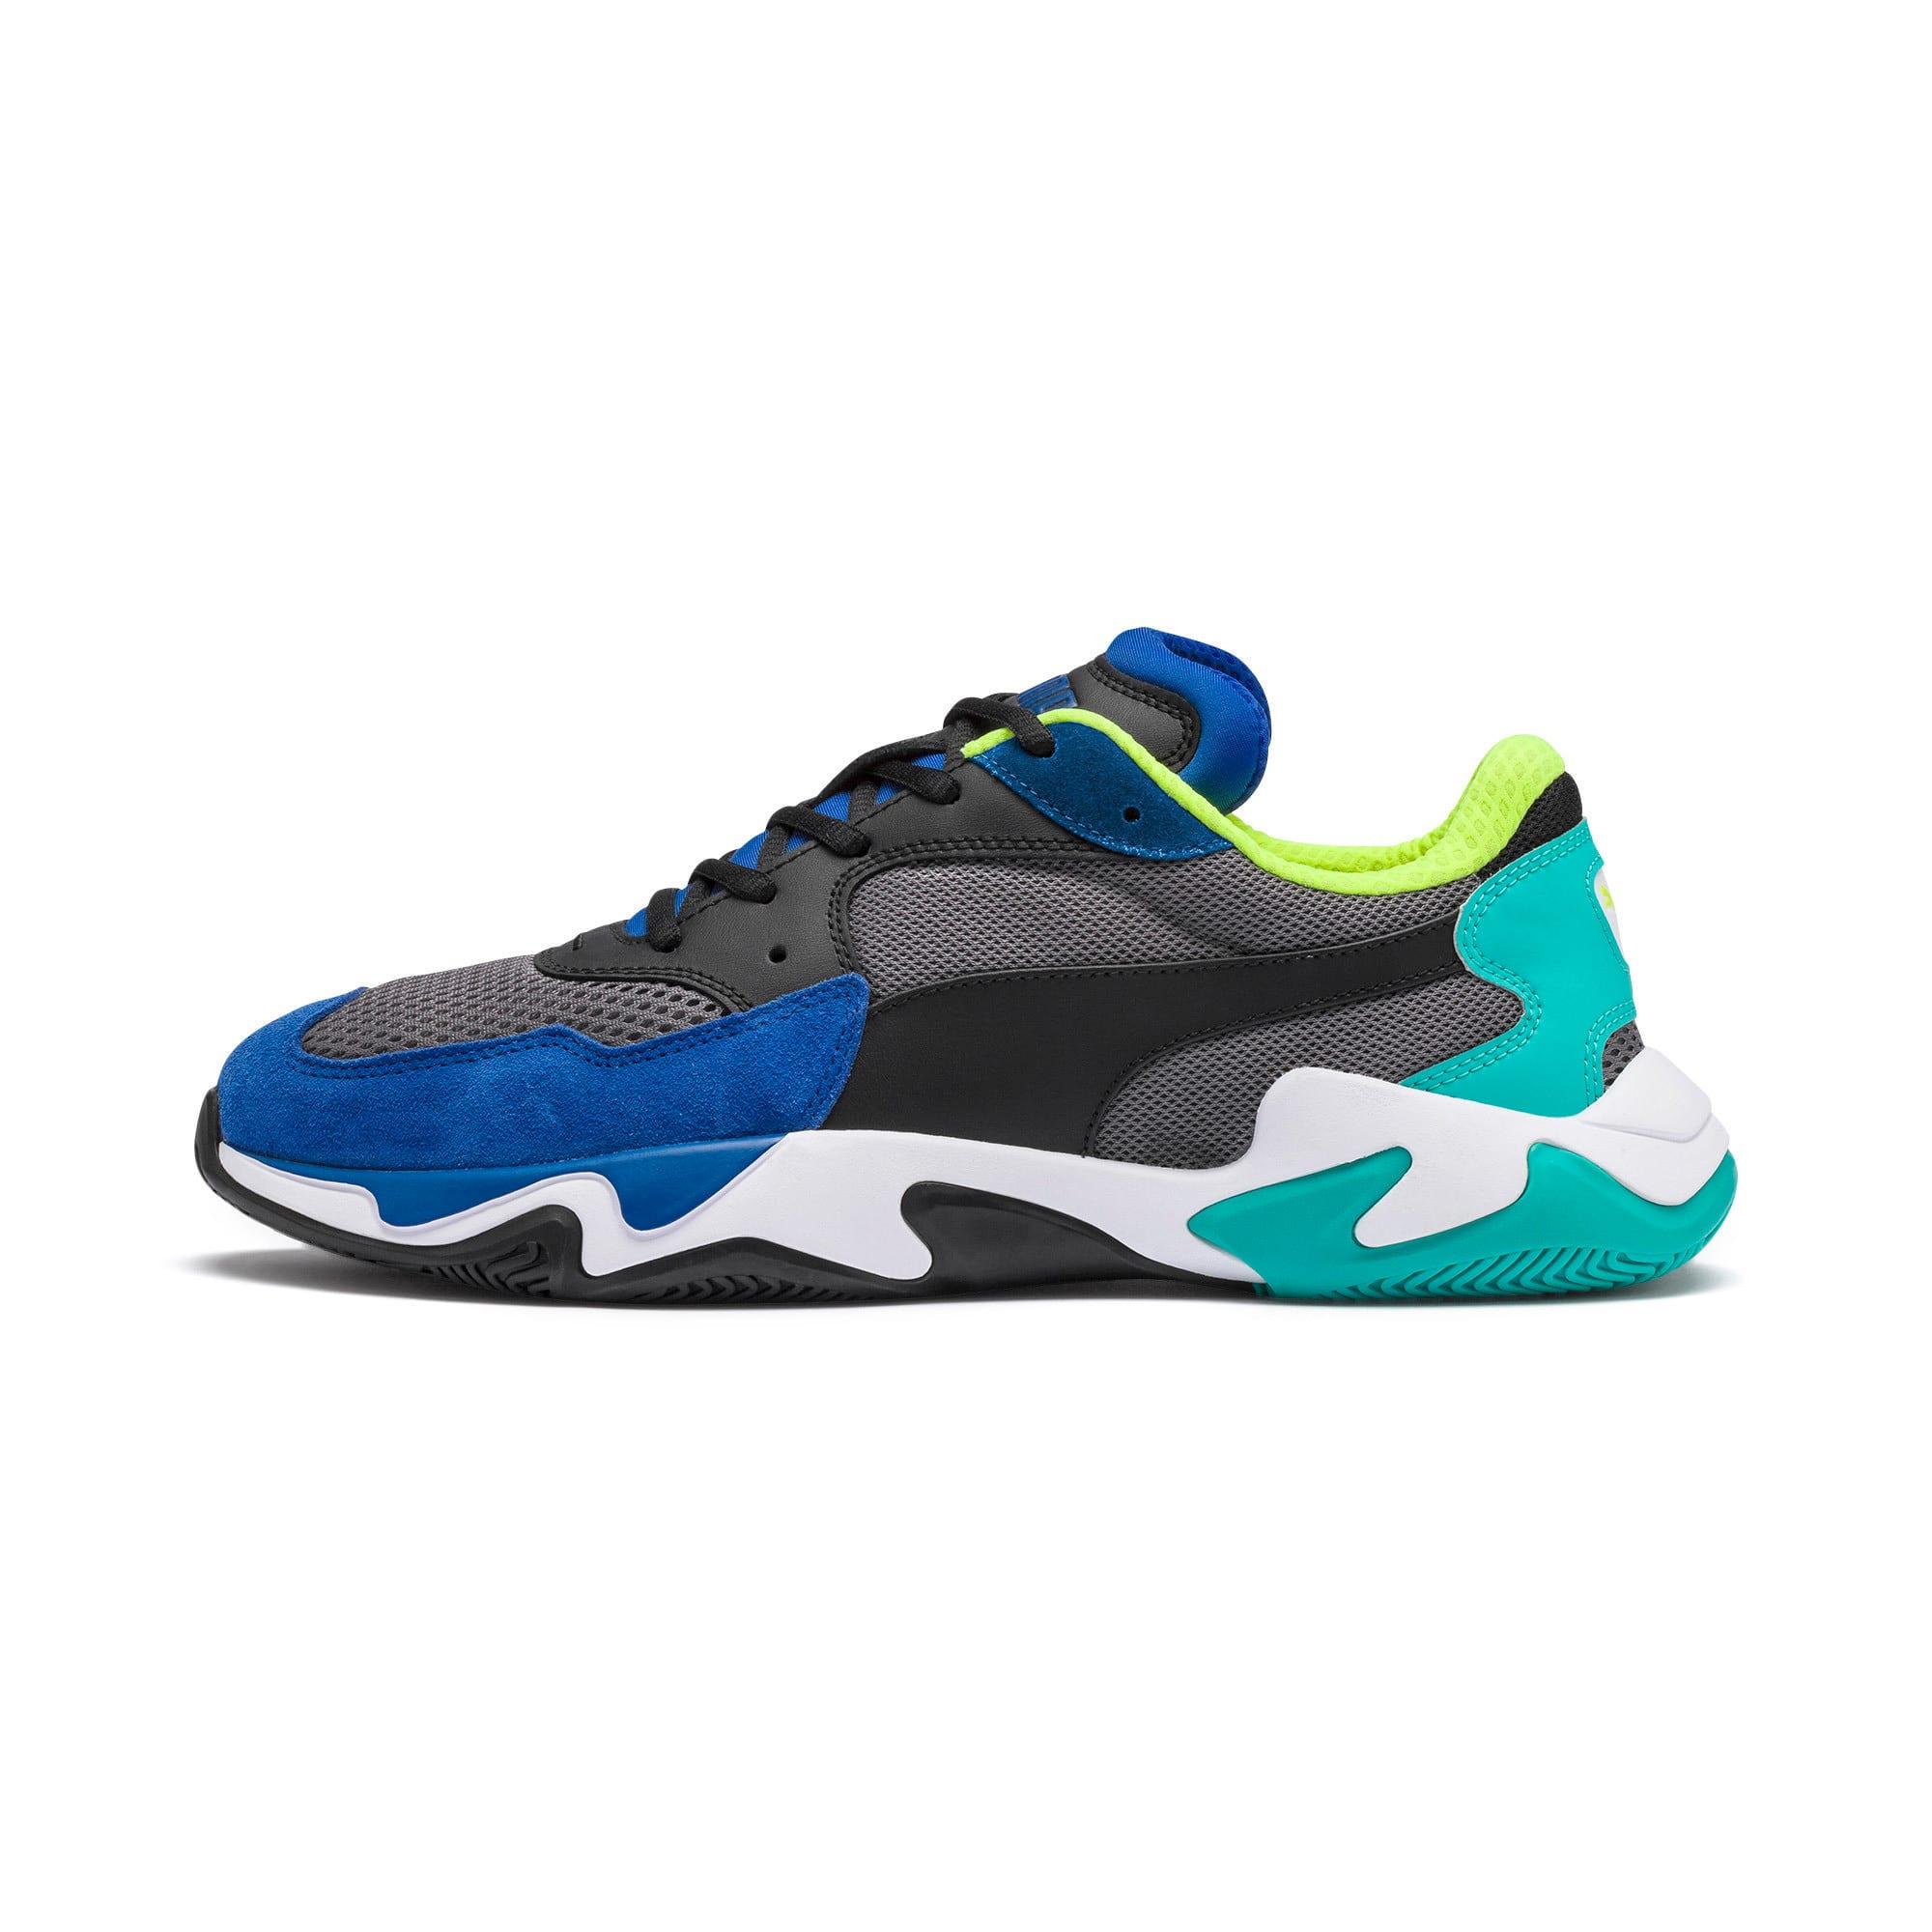 Thumbnail 1 of Storm Origin Sneaker, Galaxy Blue-CASTLEROCK, medium